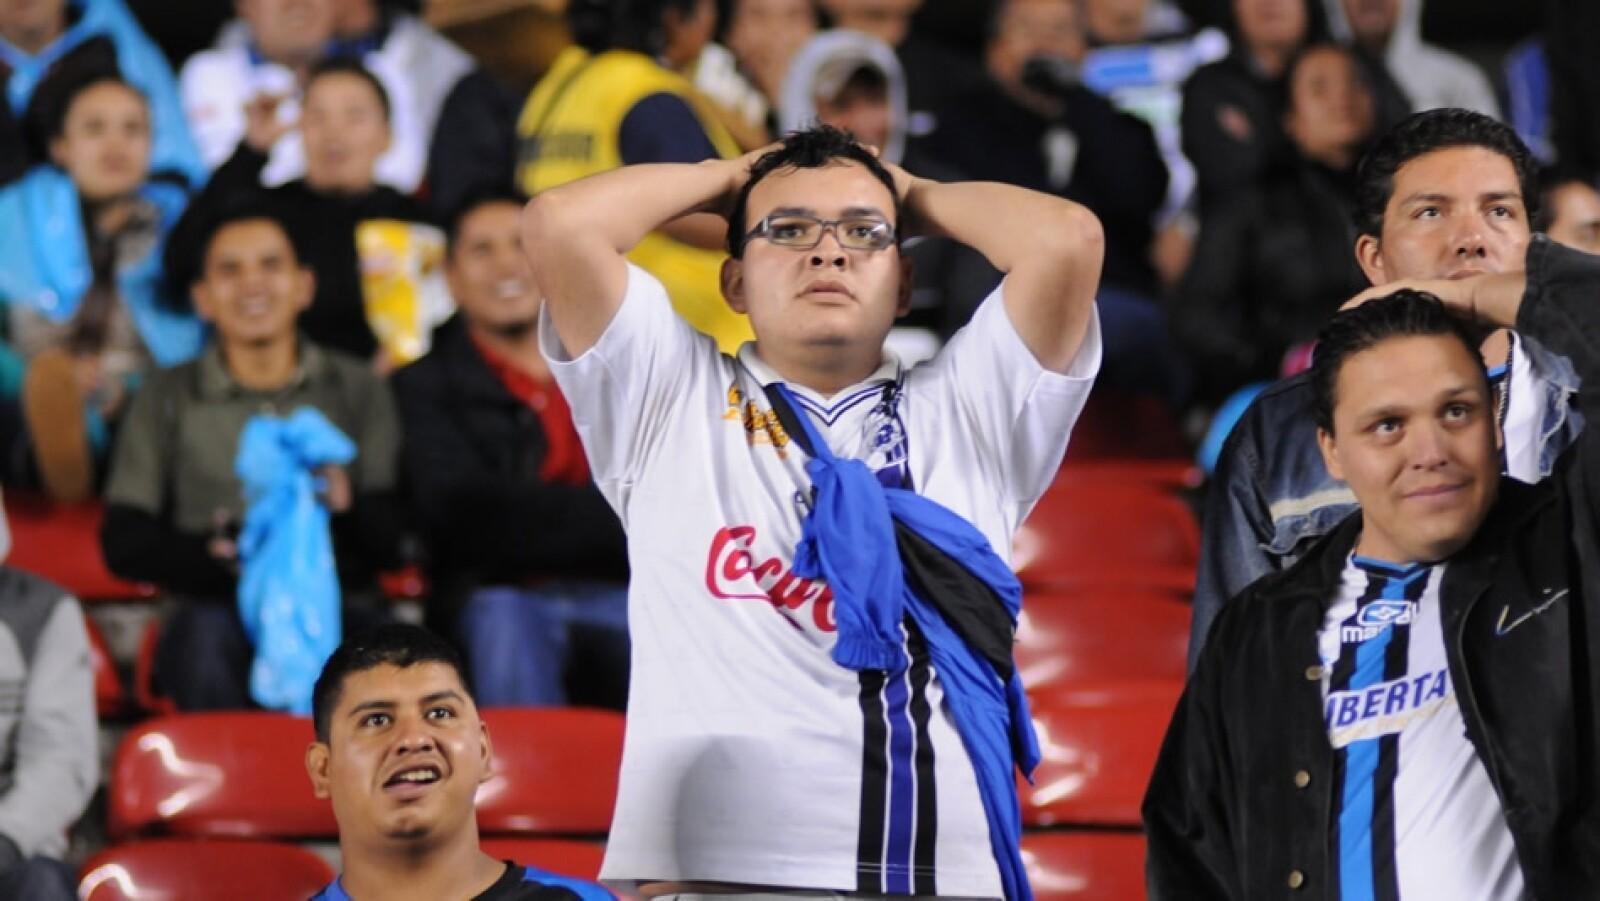 deportes, liga mx, torneo apertura, resultados liguilla, cruz azul, toluca, goles, marcador, diablos rojos, maquina